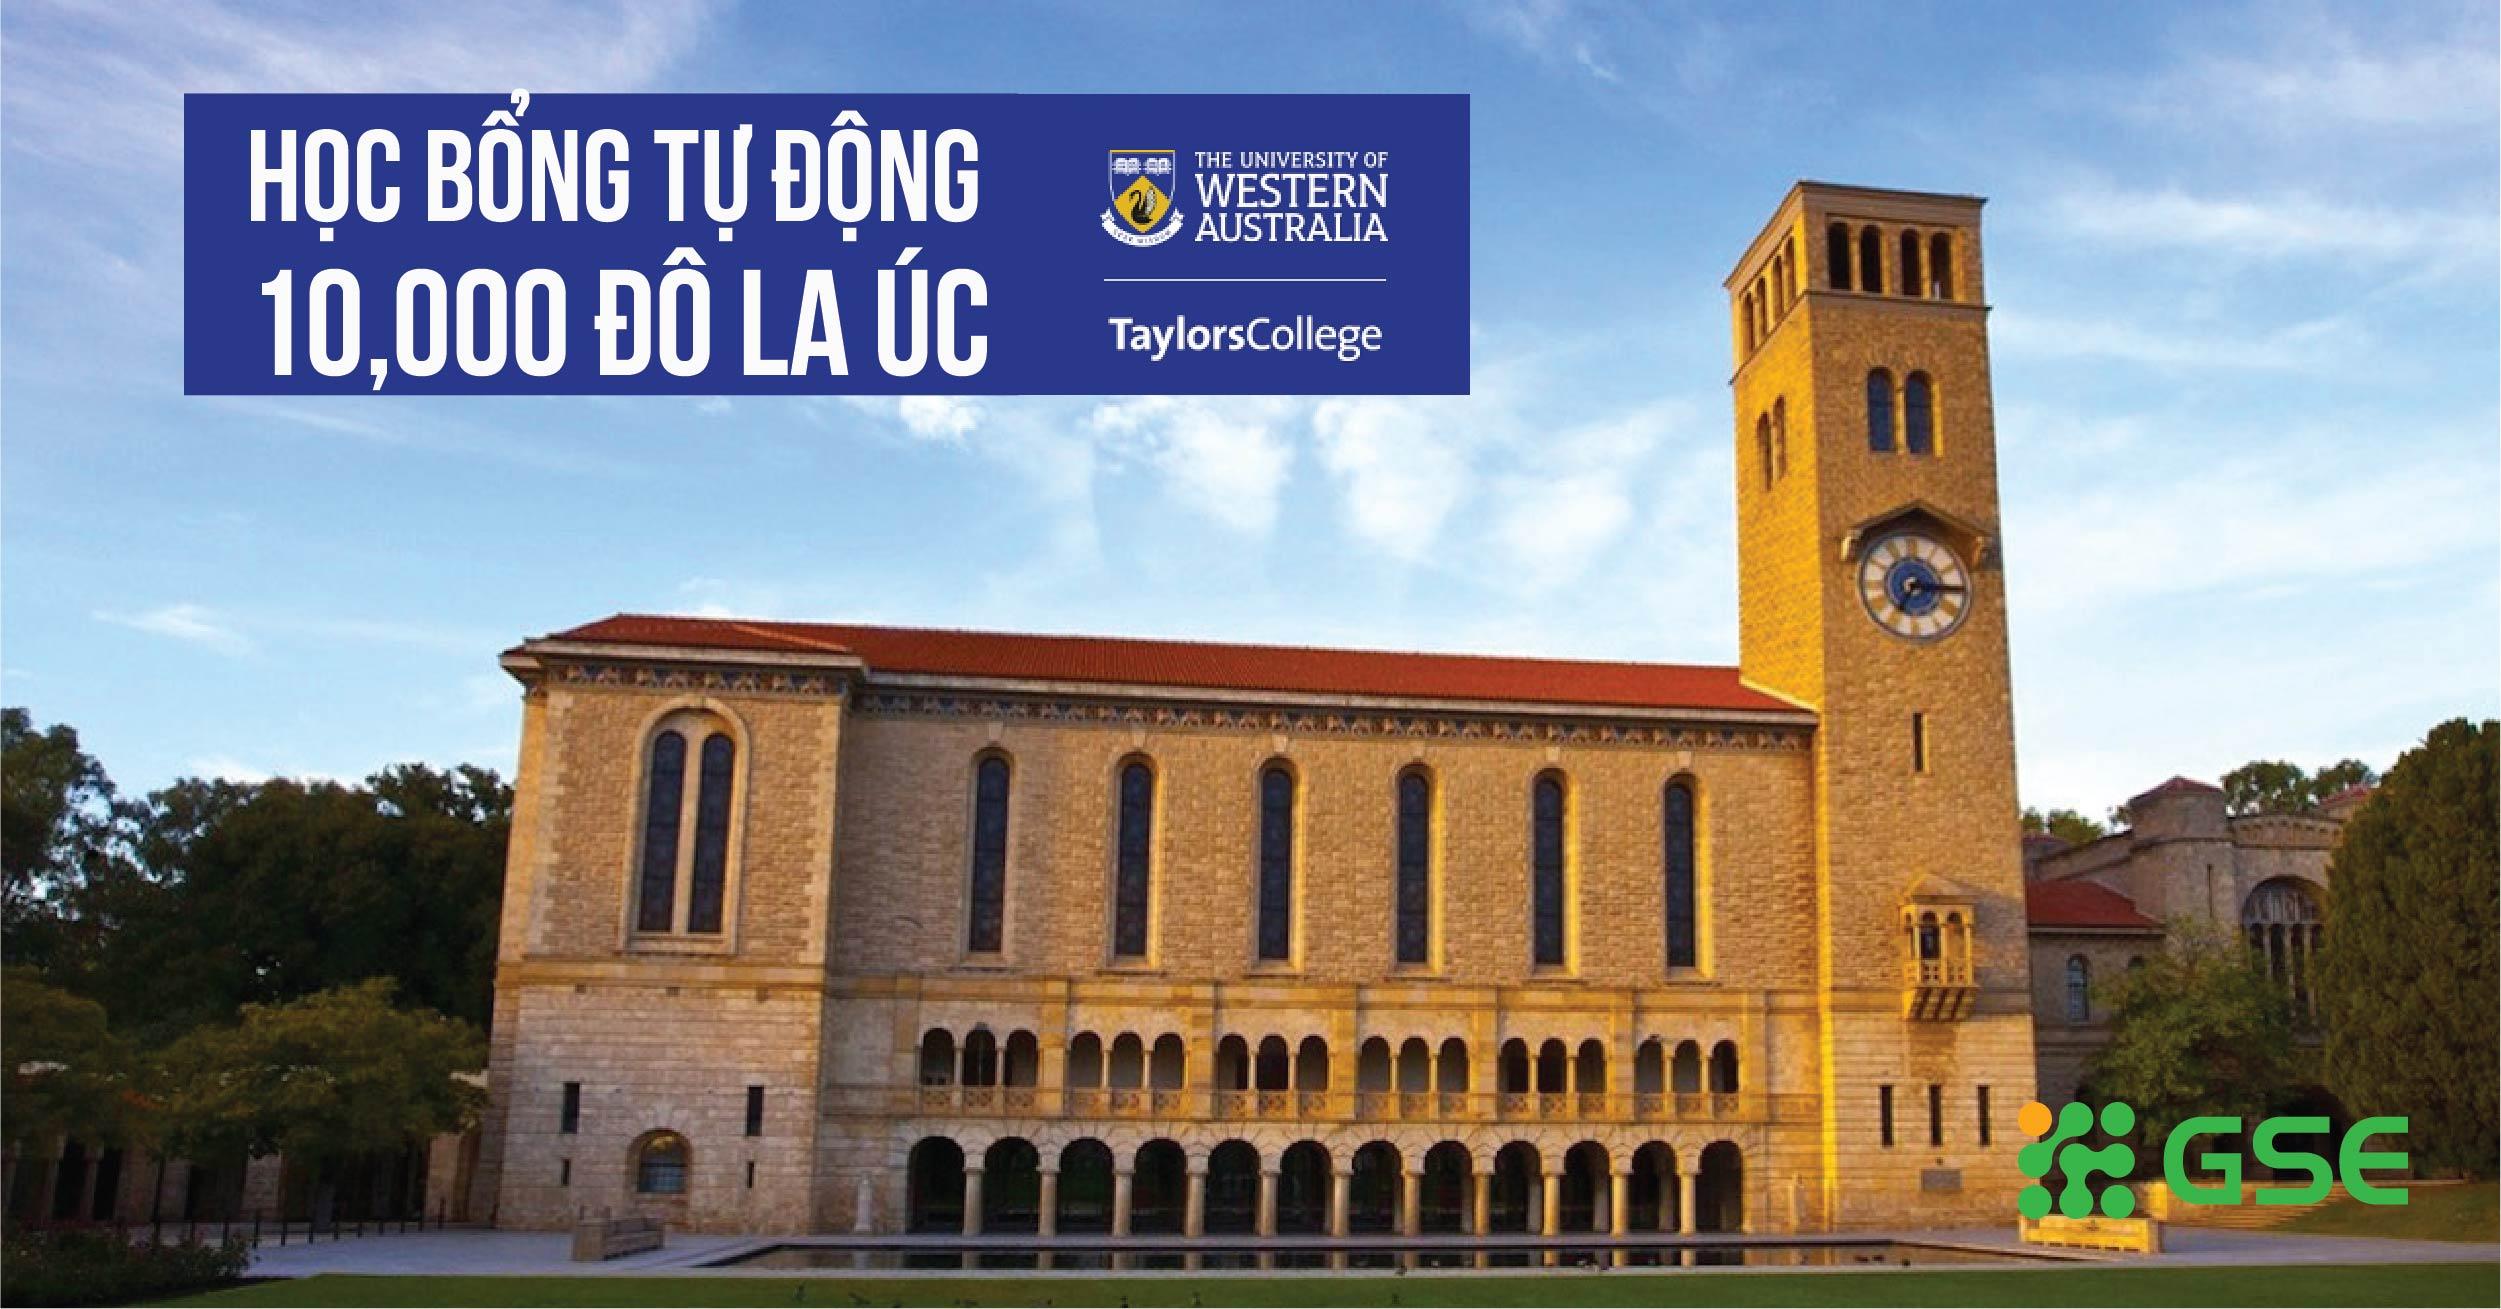 Hoc Bong University Of Western Australia 03